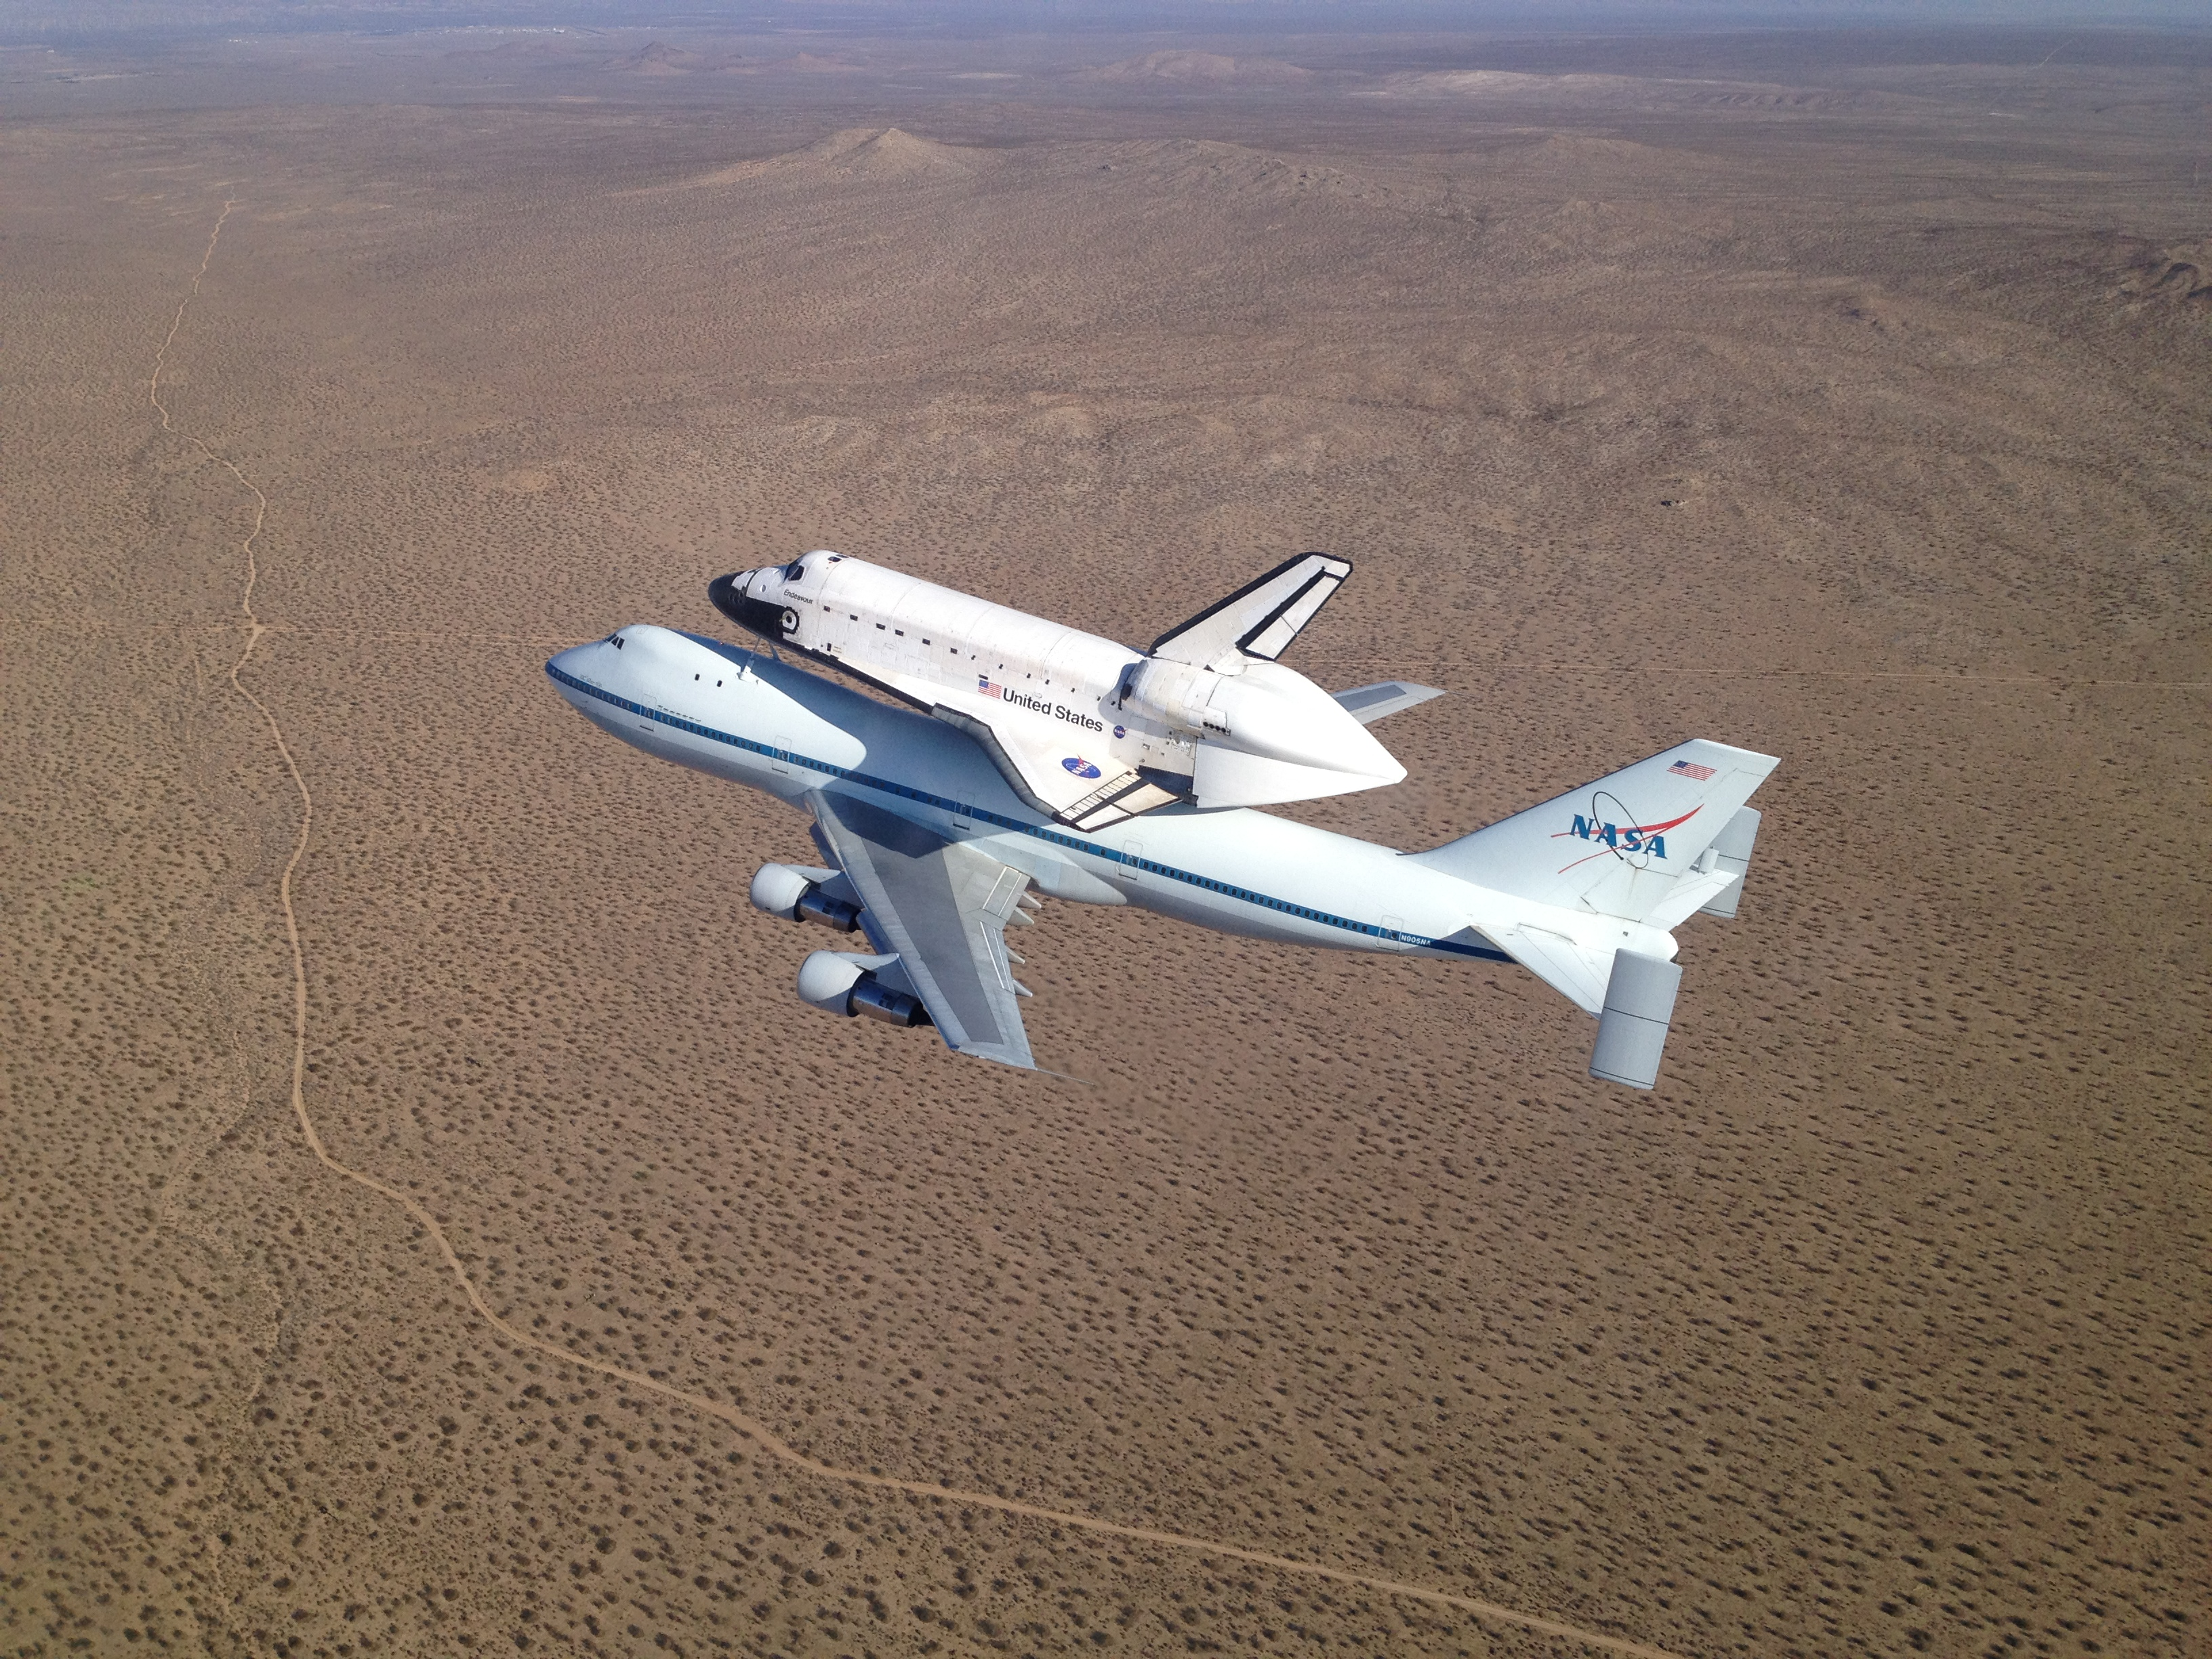 space shuttle mission landmark accomplishments - photo #29